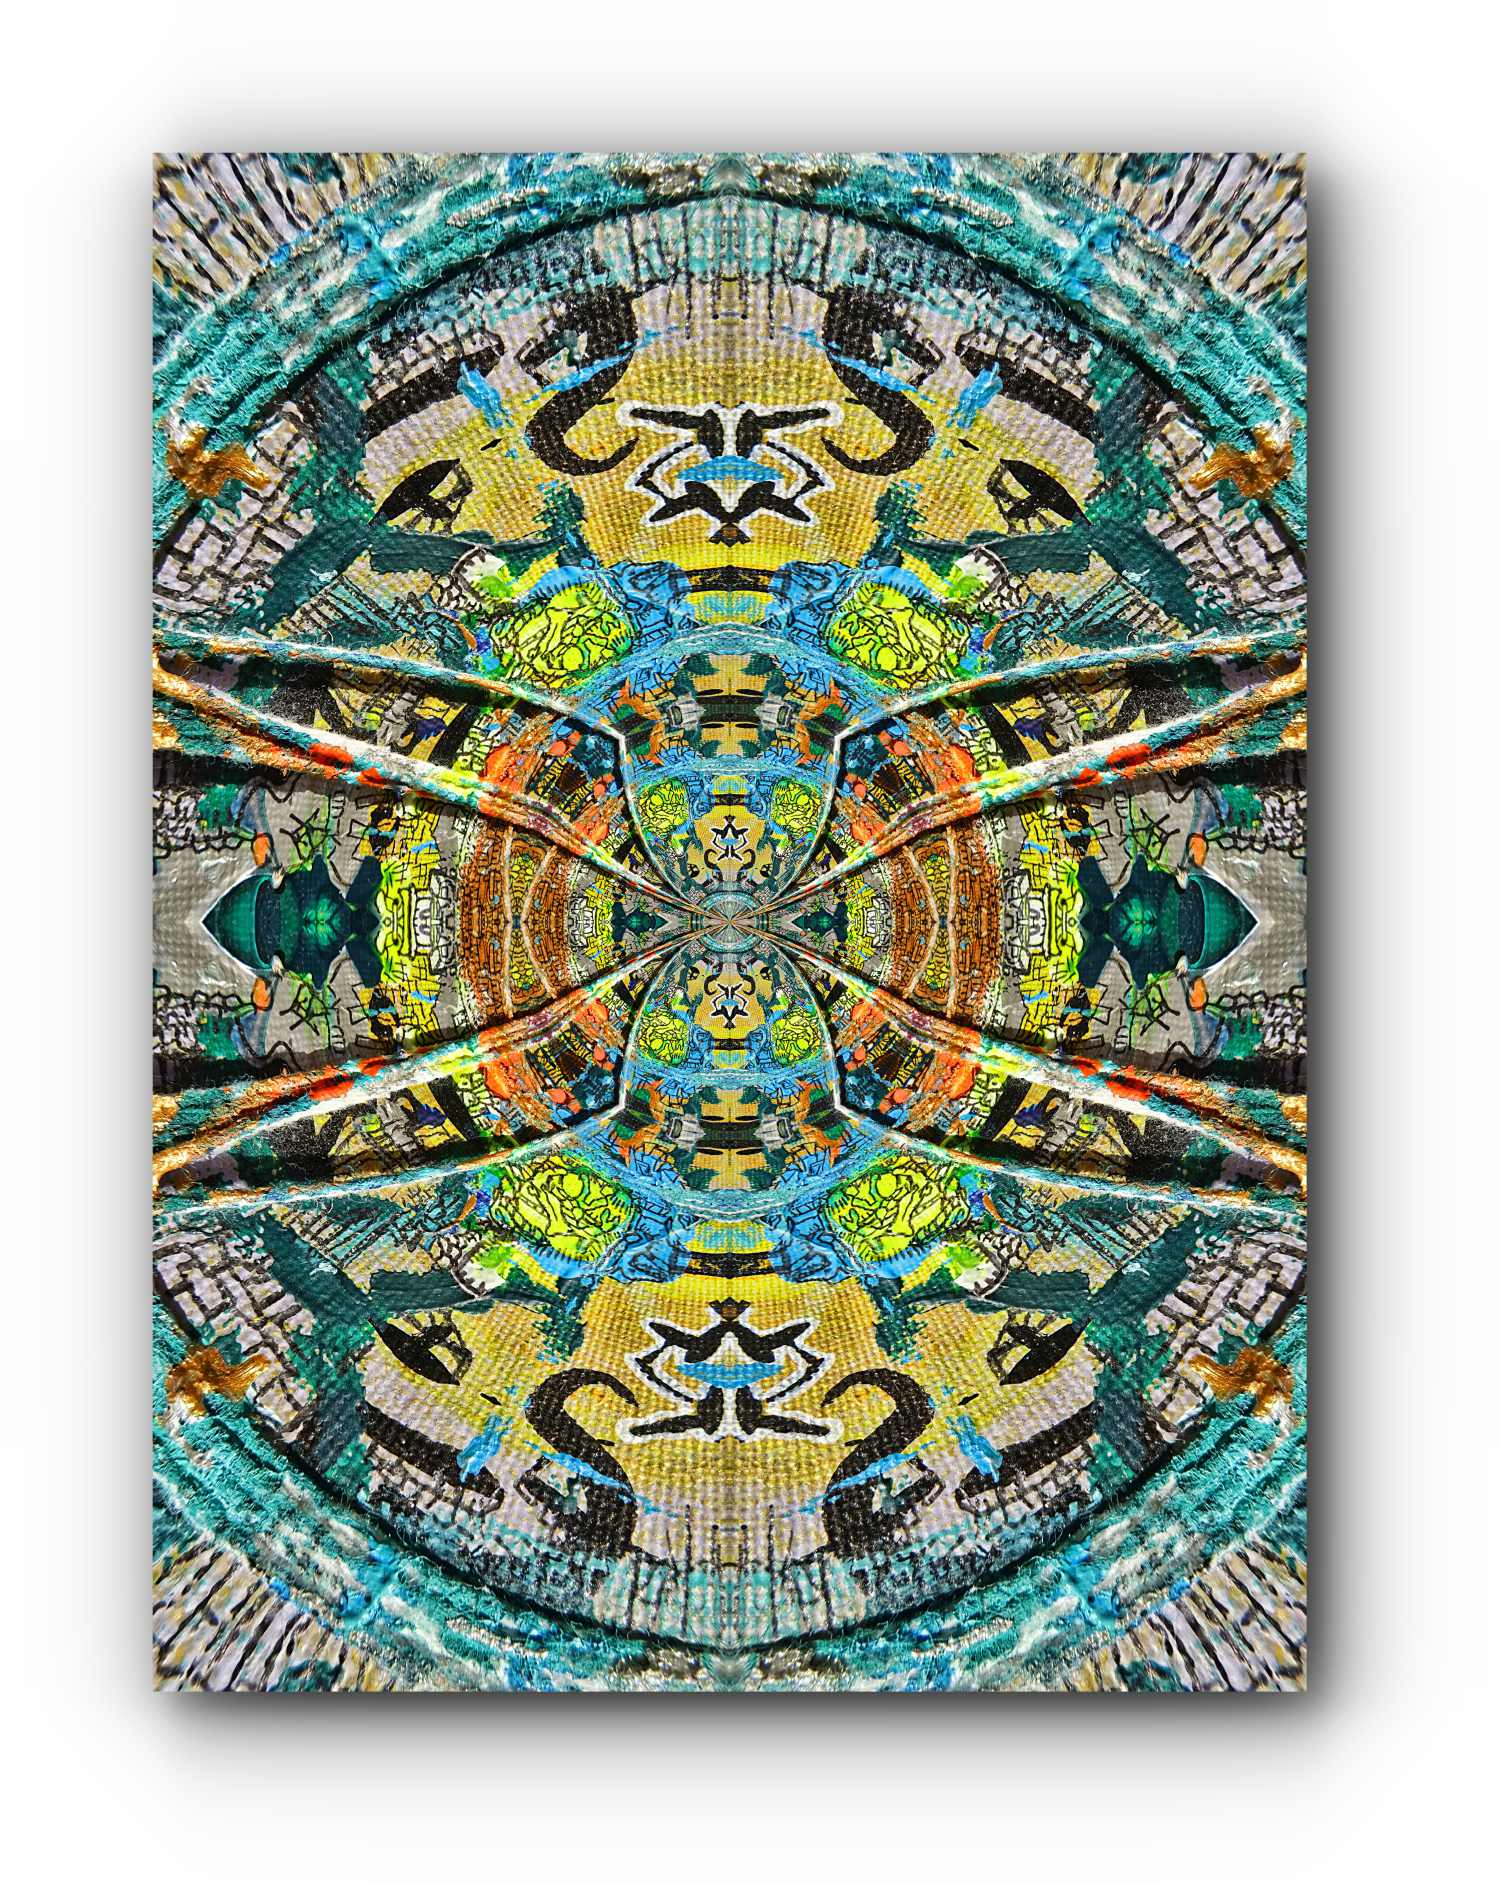 digital-art-orb-weaver-8-artists-ingress-vortices.jpg